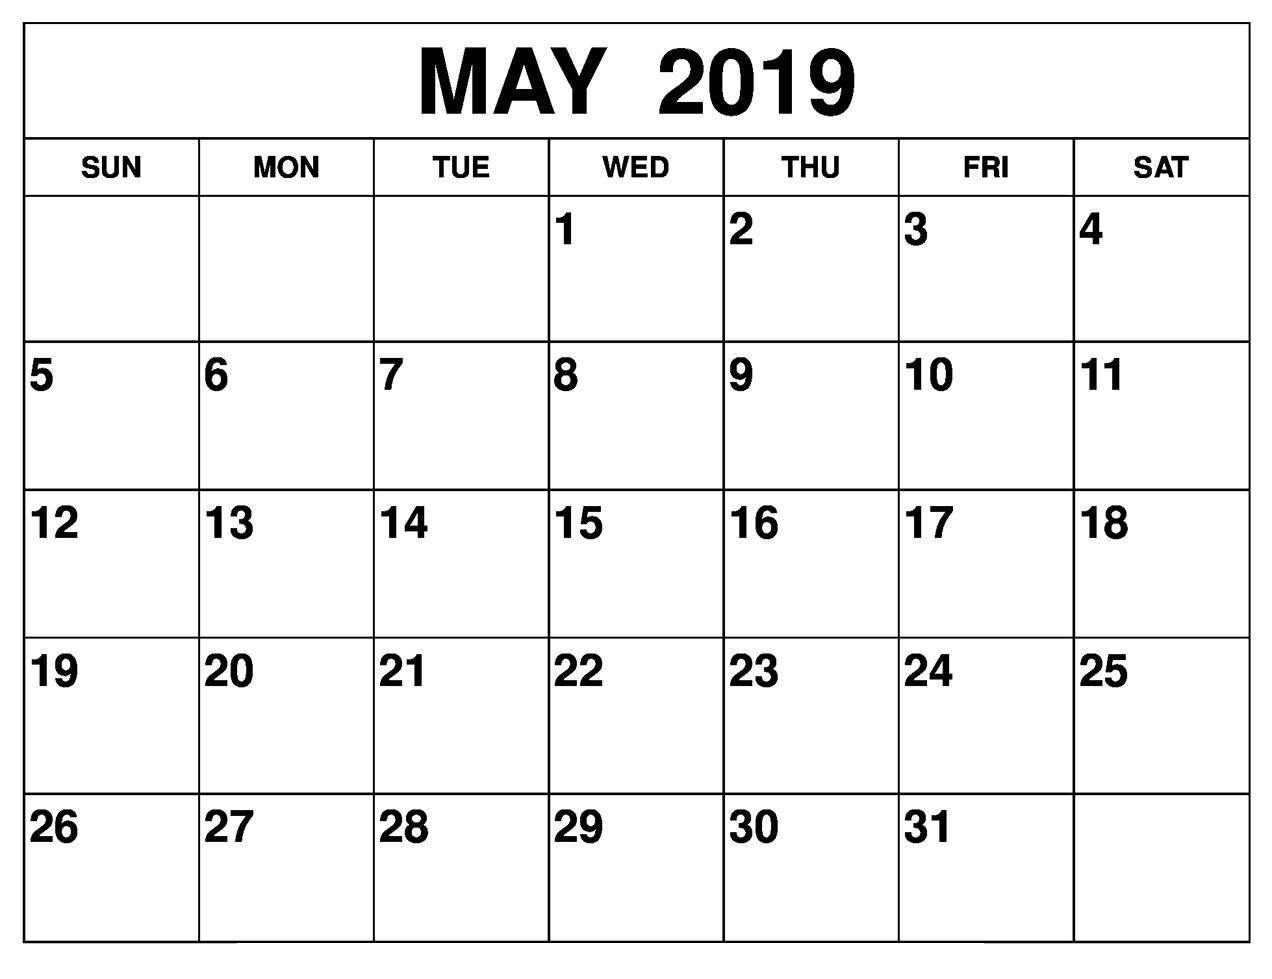 Blank May 2019 Calendar Editable Template - Free Printable Calendar